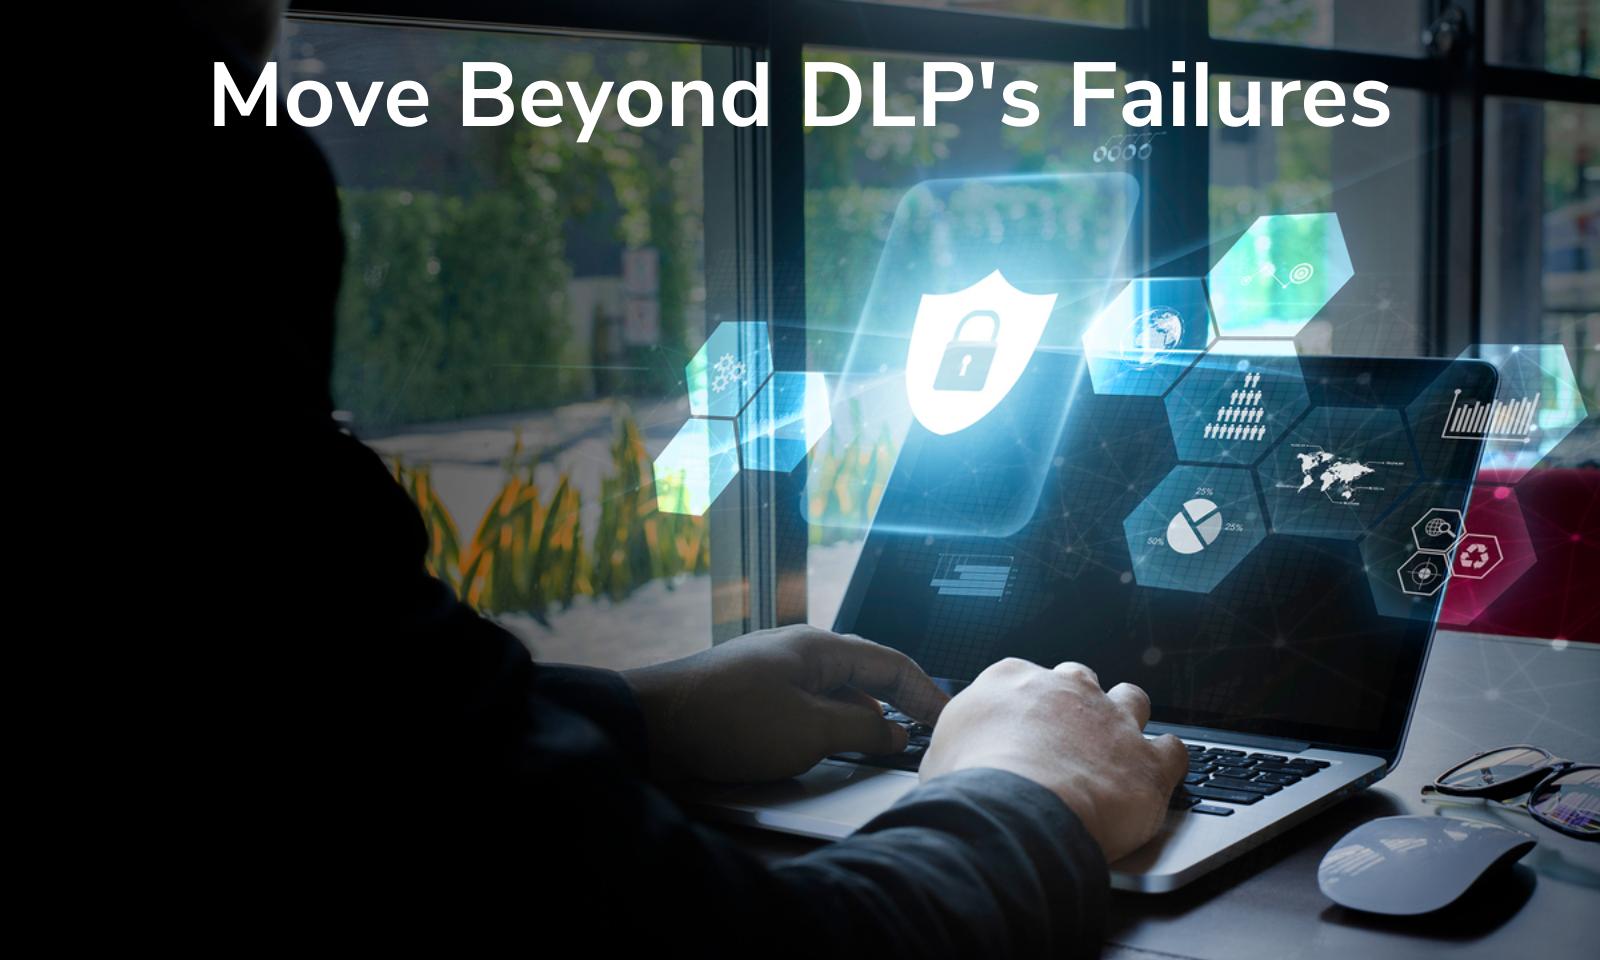 Move Beyond DLP's Failures